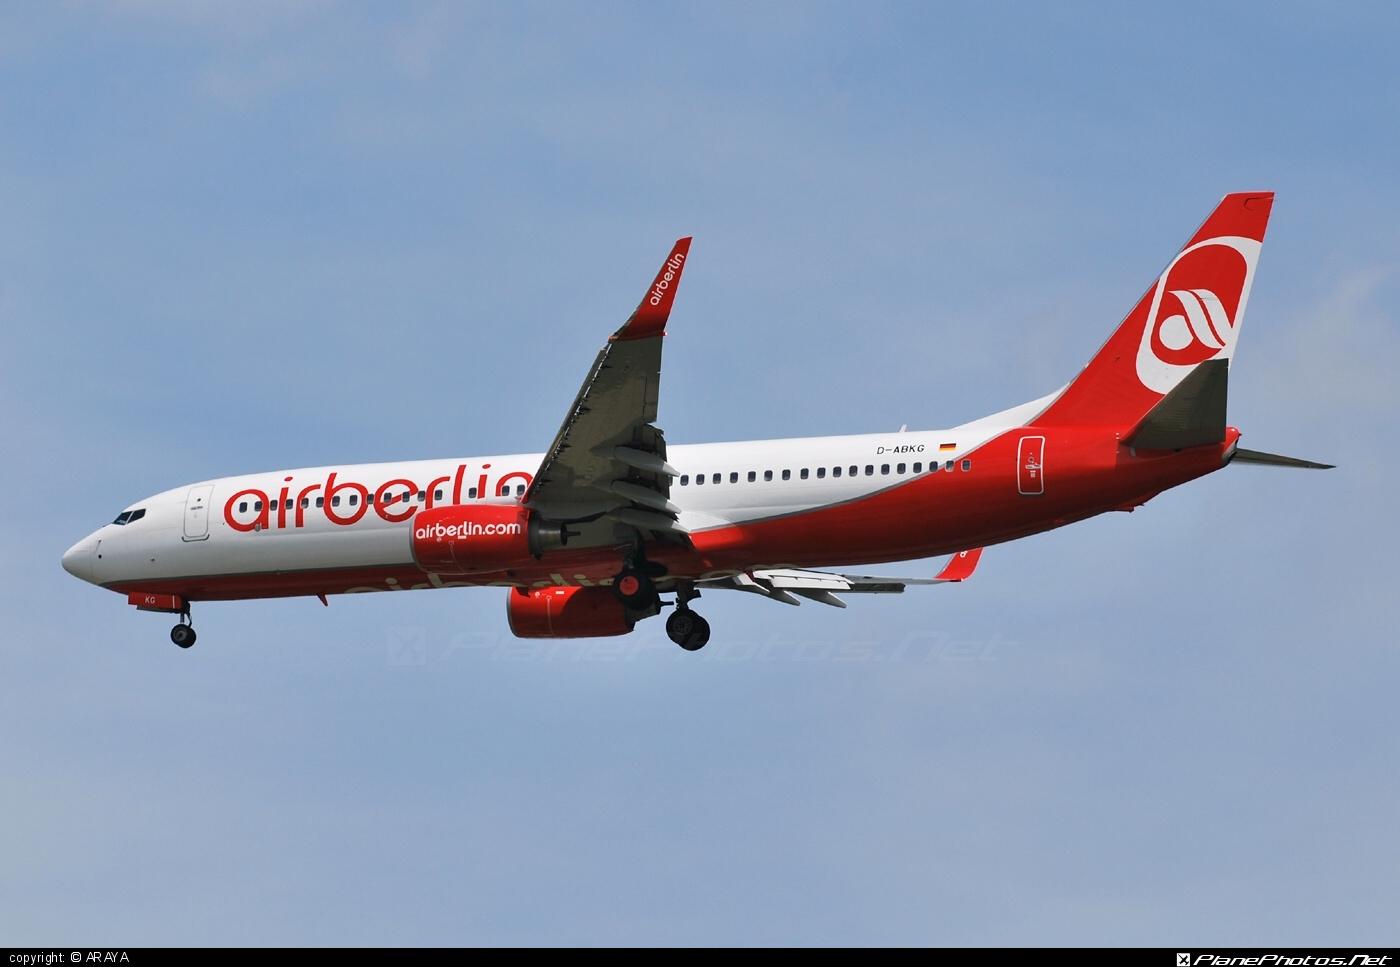 Boeing 737-800 - D-ABKG operated by Air Berlin #airberlin #b737 #b737nextgen #b737ng #boeing #boeing737